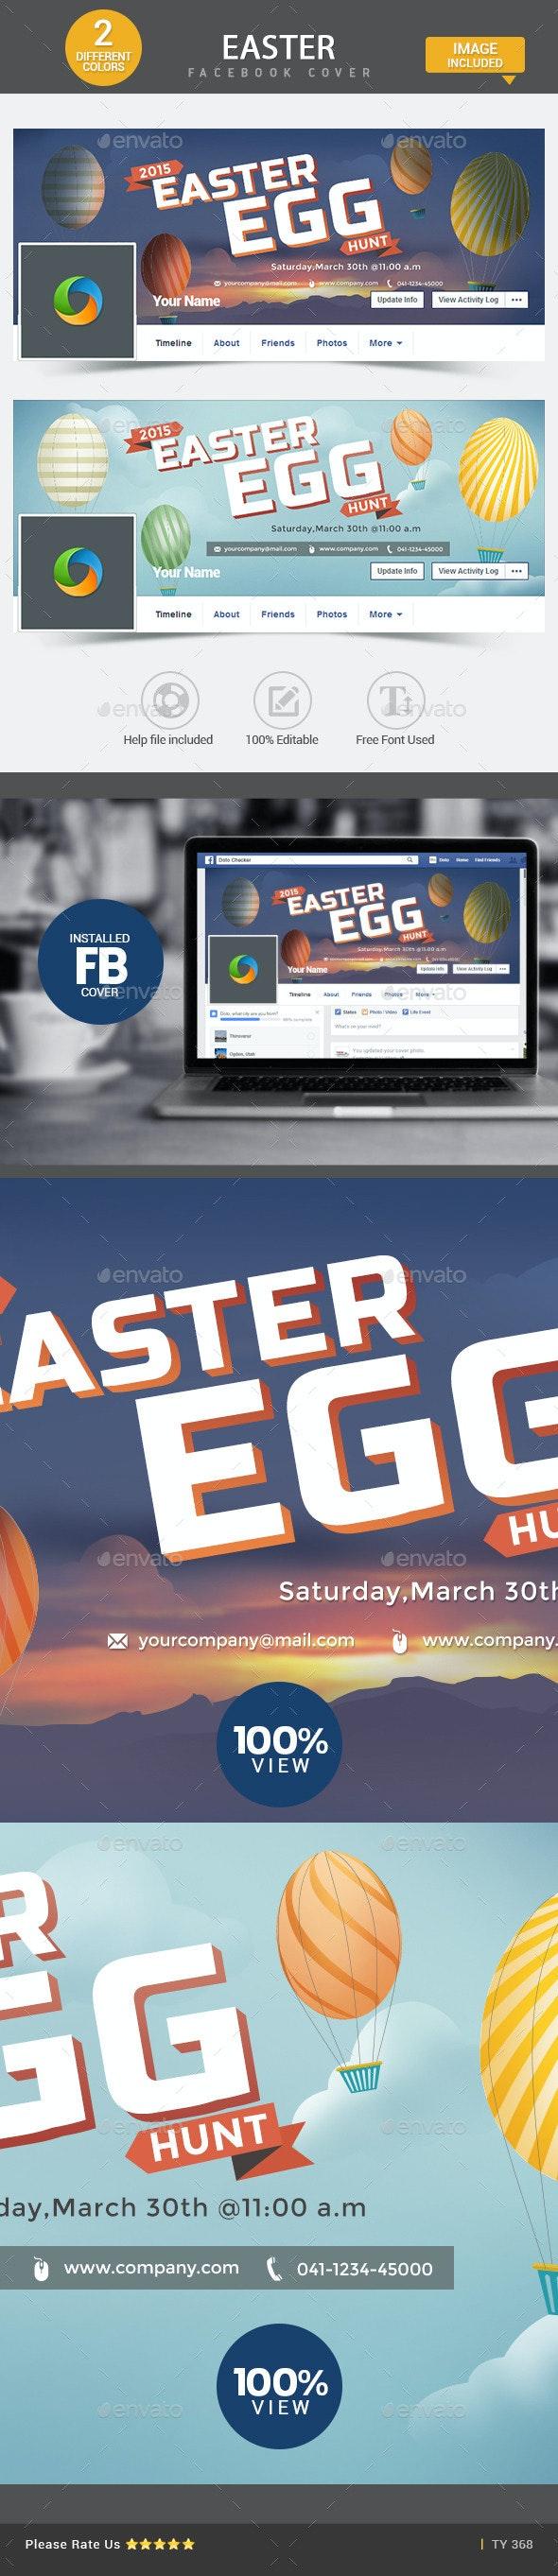 Easter Facebook Cover - Facebook Timeline Covers Social Media